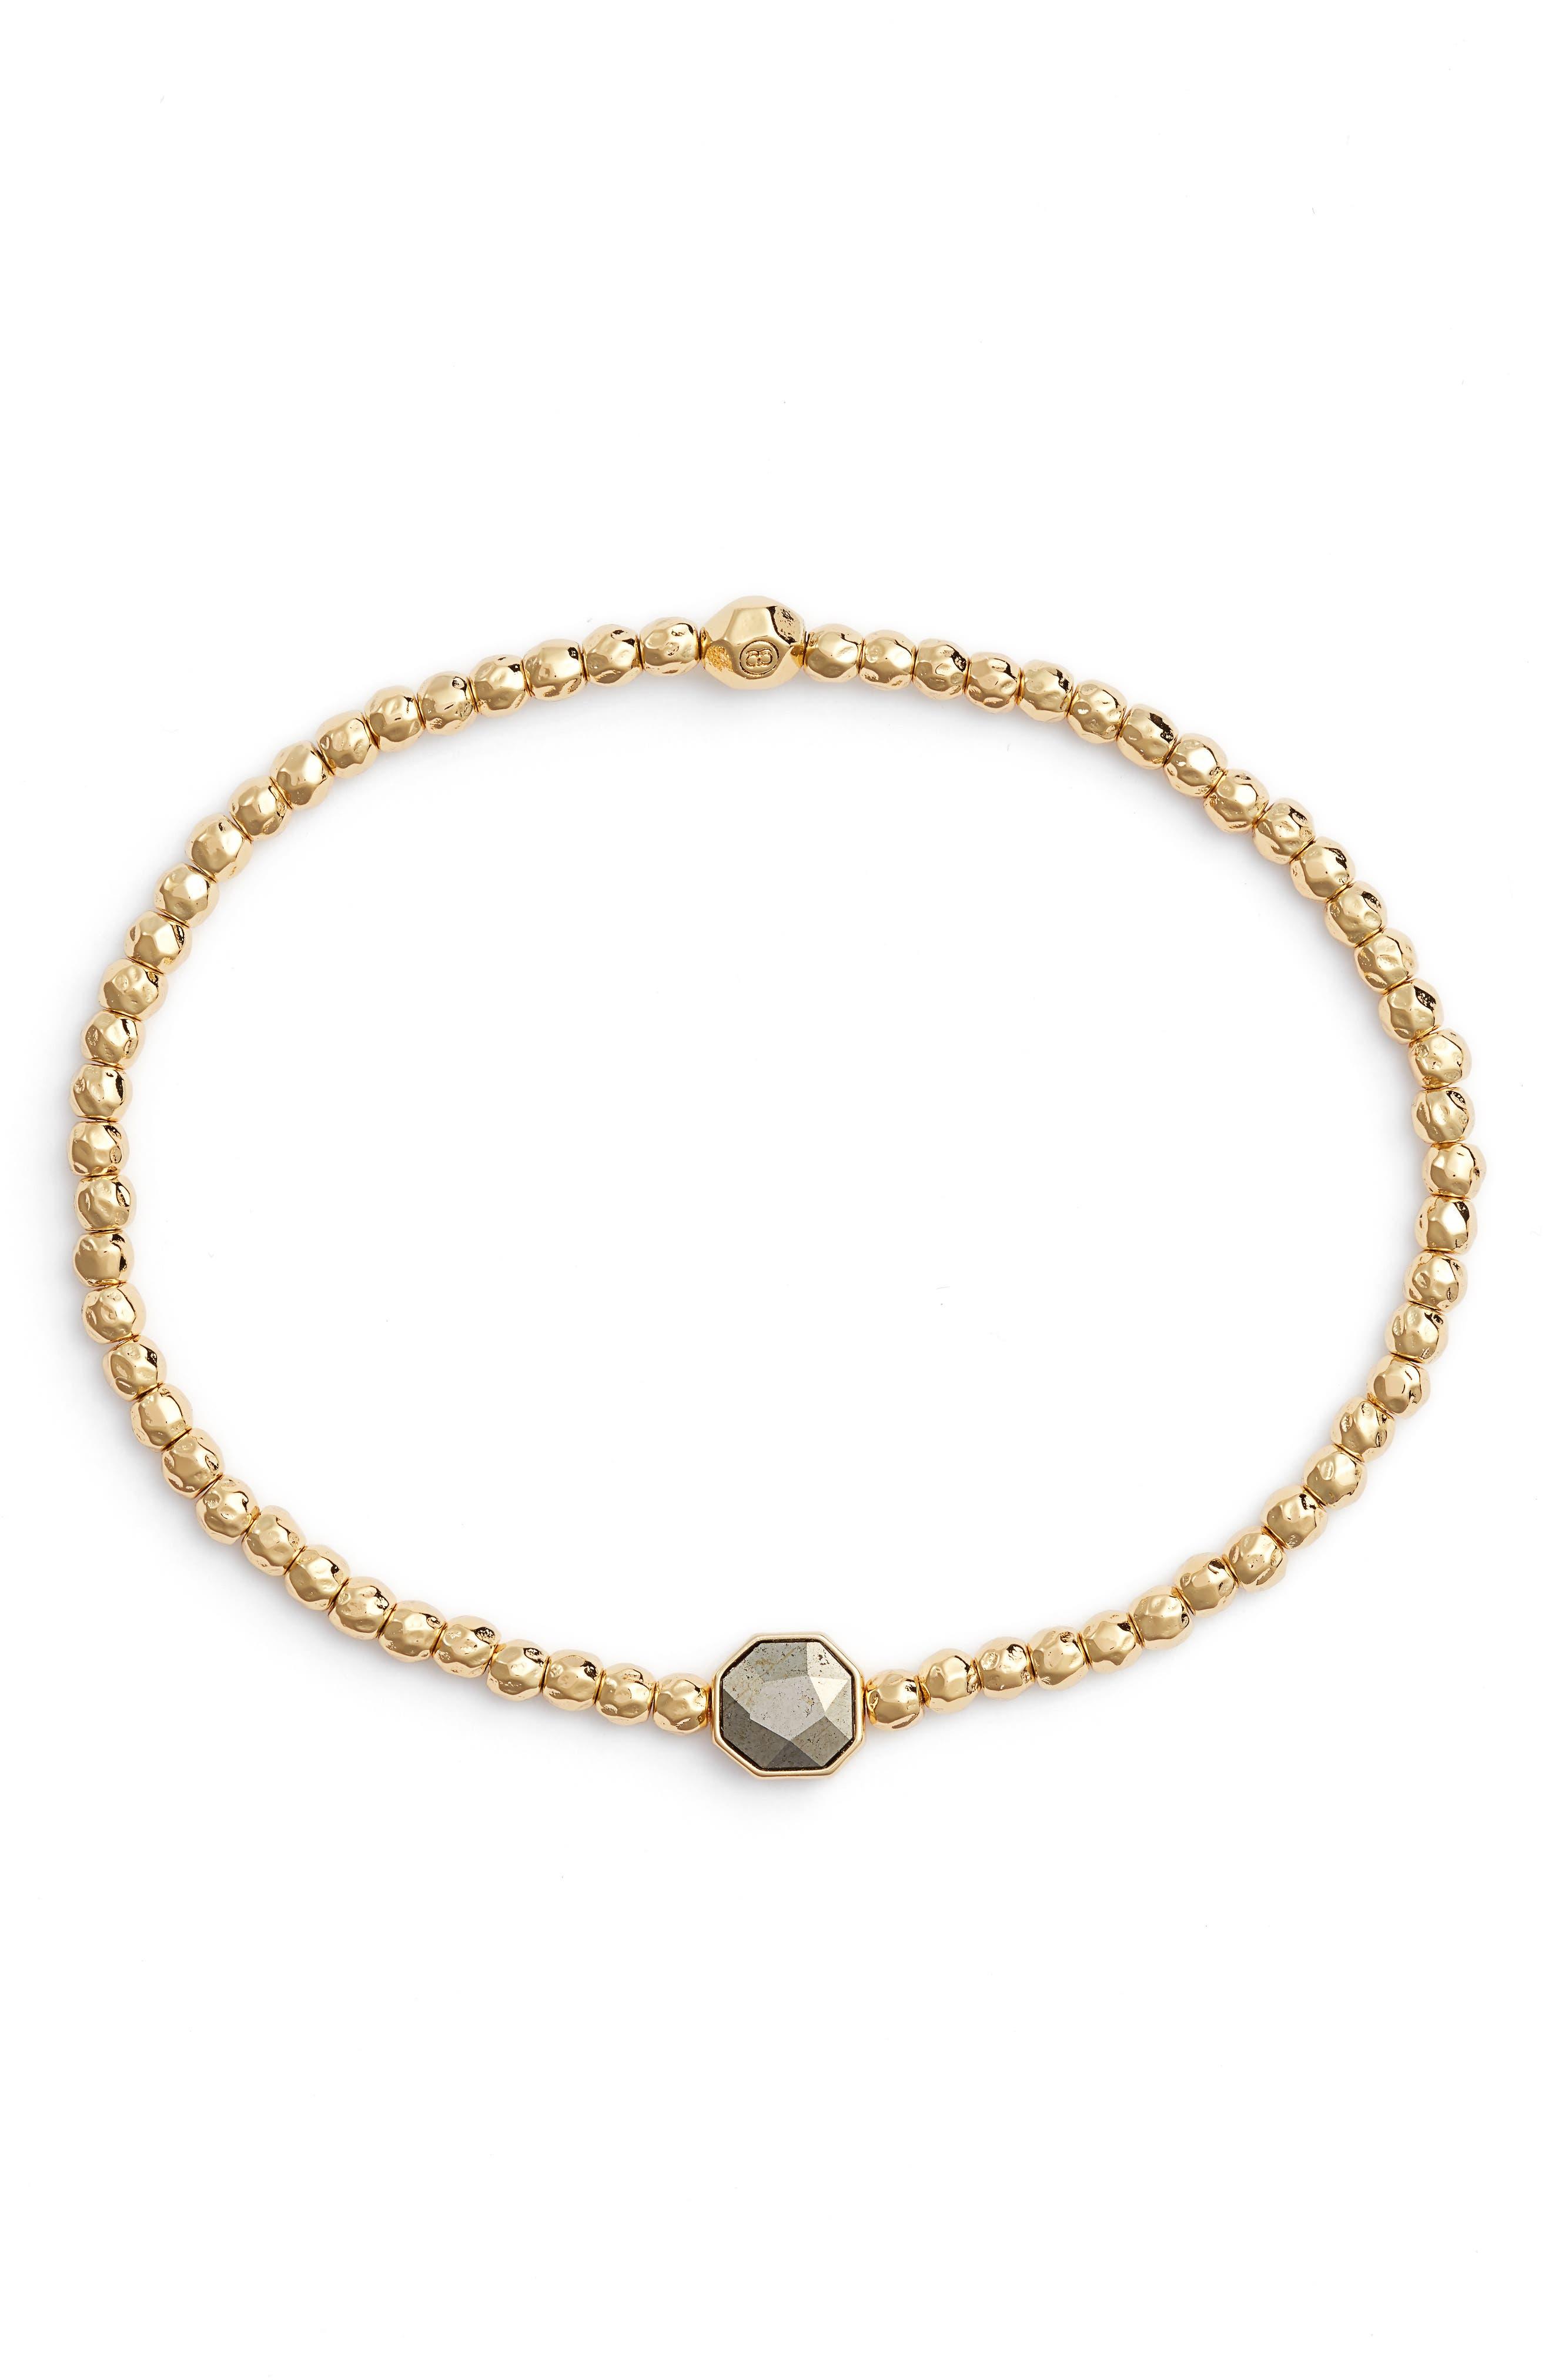 Power Gemstone Beaded Bracelet in Pyrite/ Gold